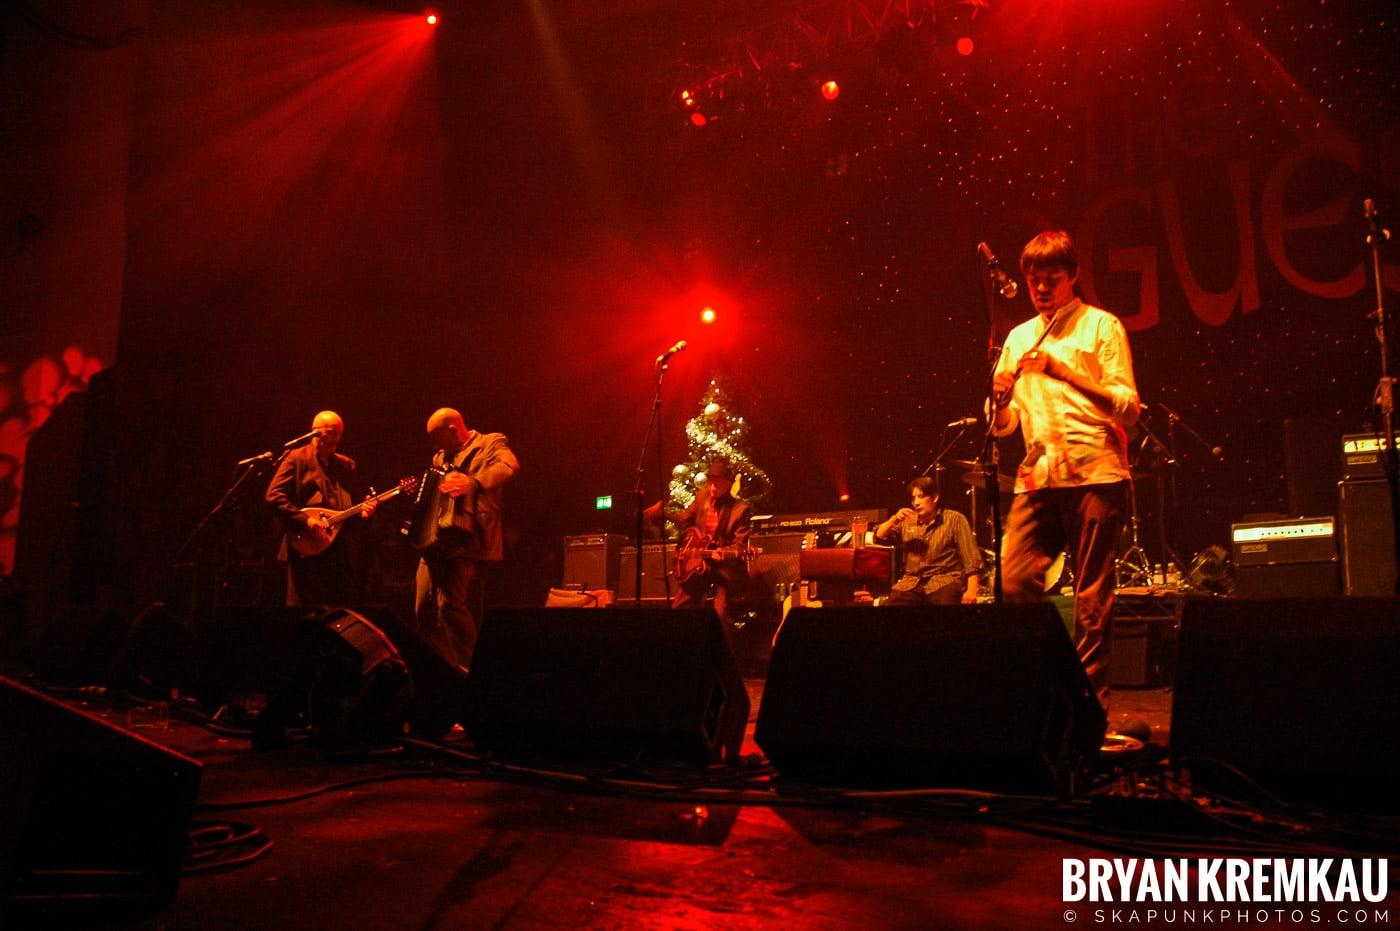 The Pogues @ Brixton Academy, London UK - 12.19.05 (3)